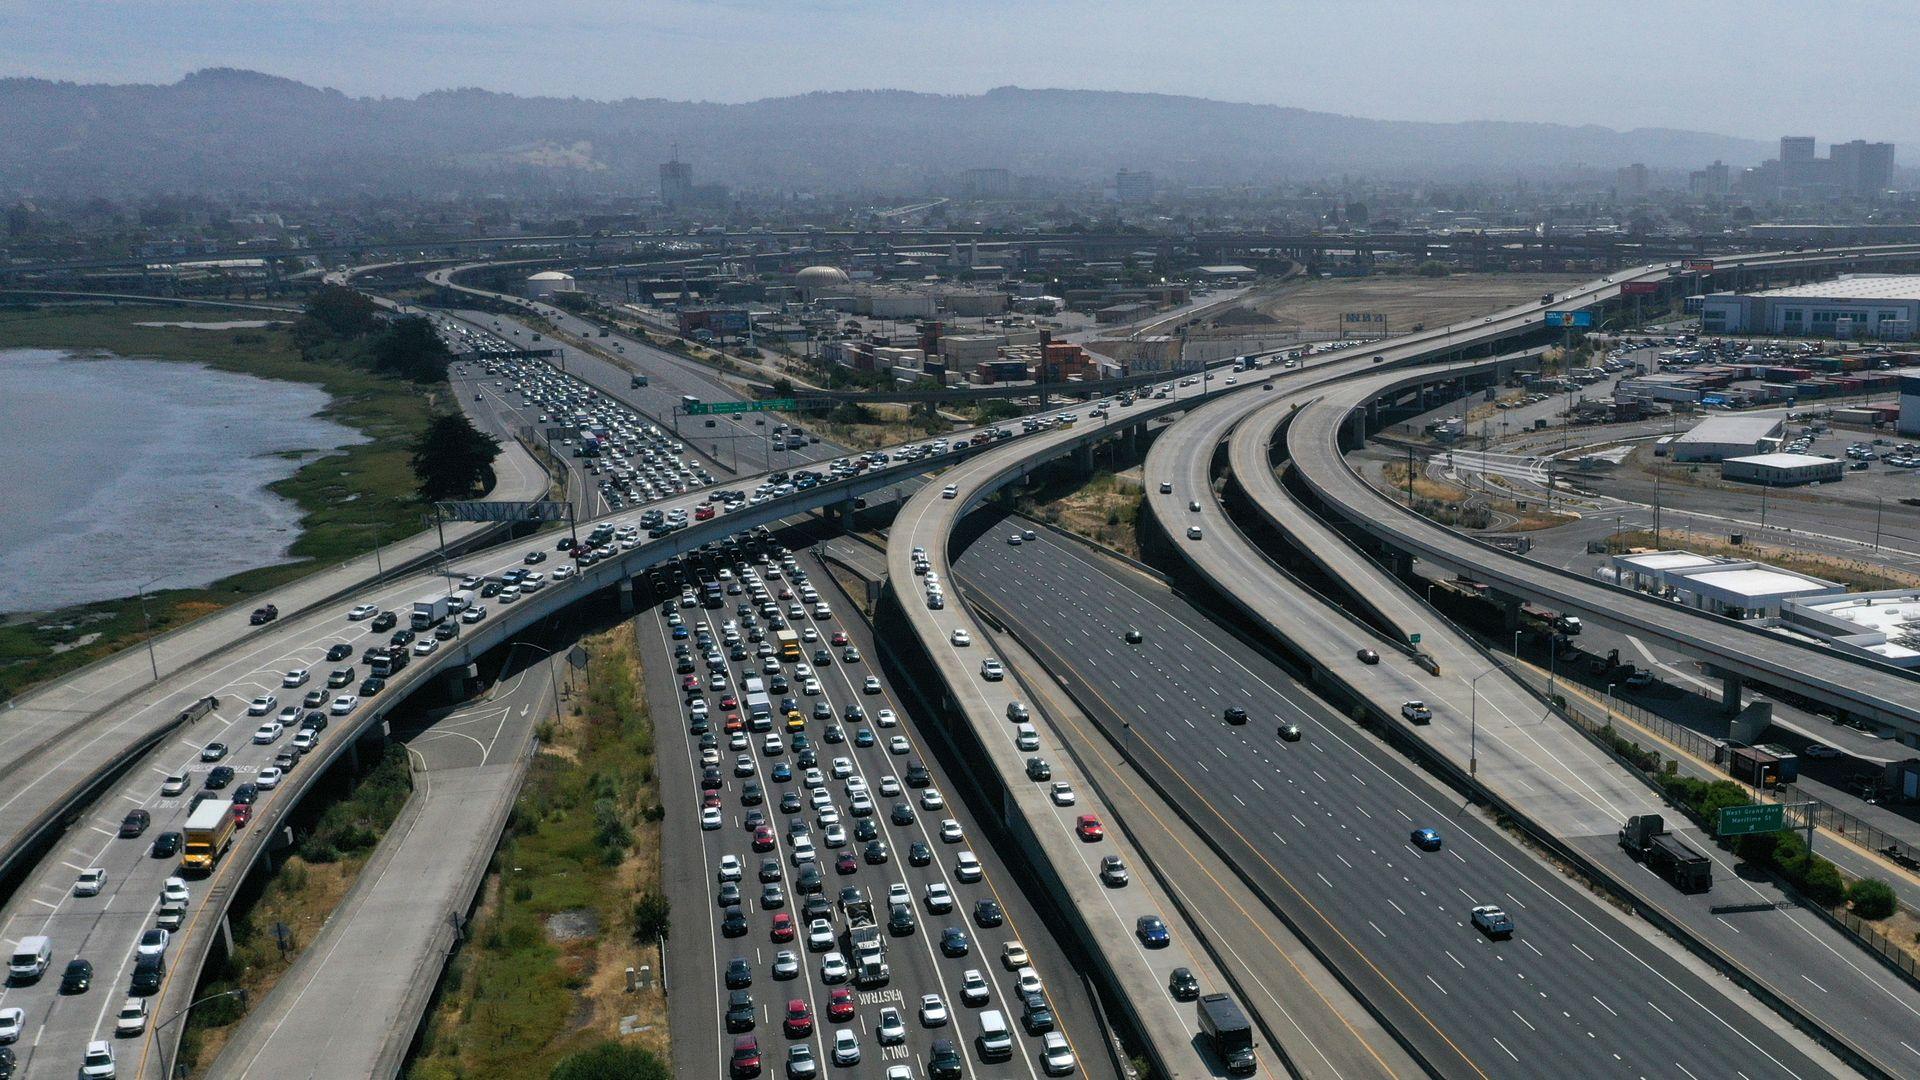 Traffic backs up at the San Francisco-Oakland Bay Bridge toll plaza along Interstate 80 on July 25